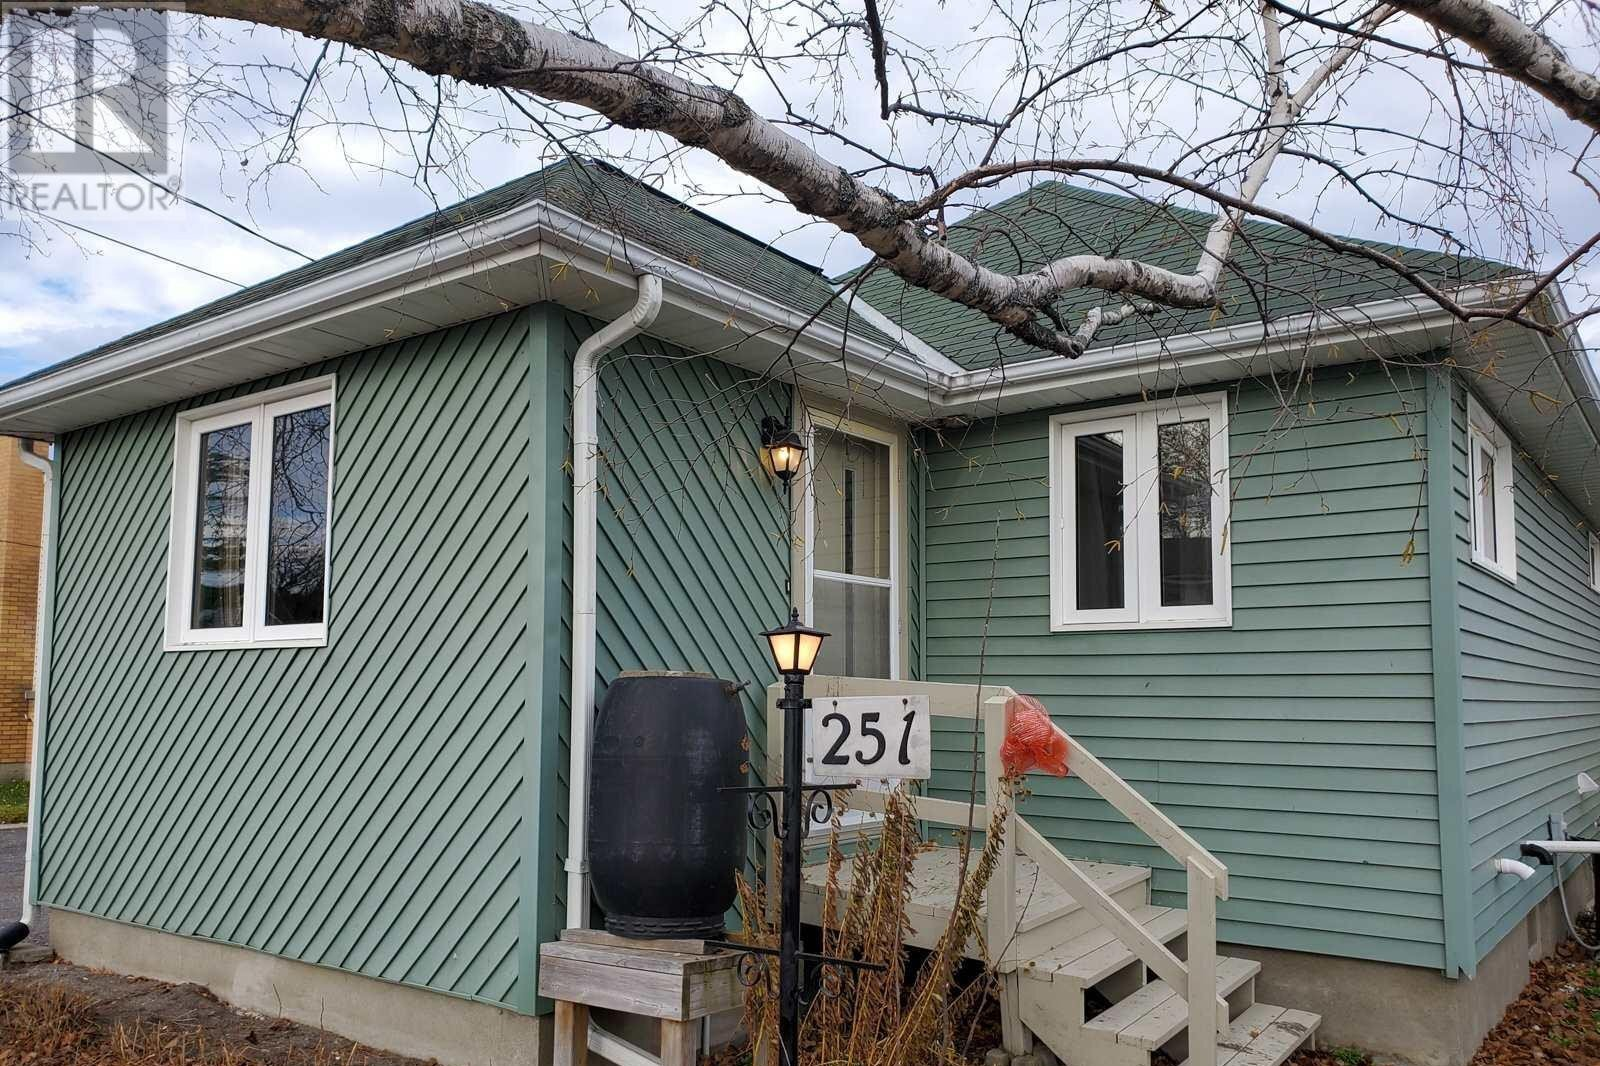 House for sale at 251 Mccamus Ave Temiskaming Shores Ontario - MLS: TM202226